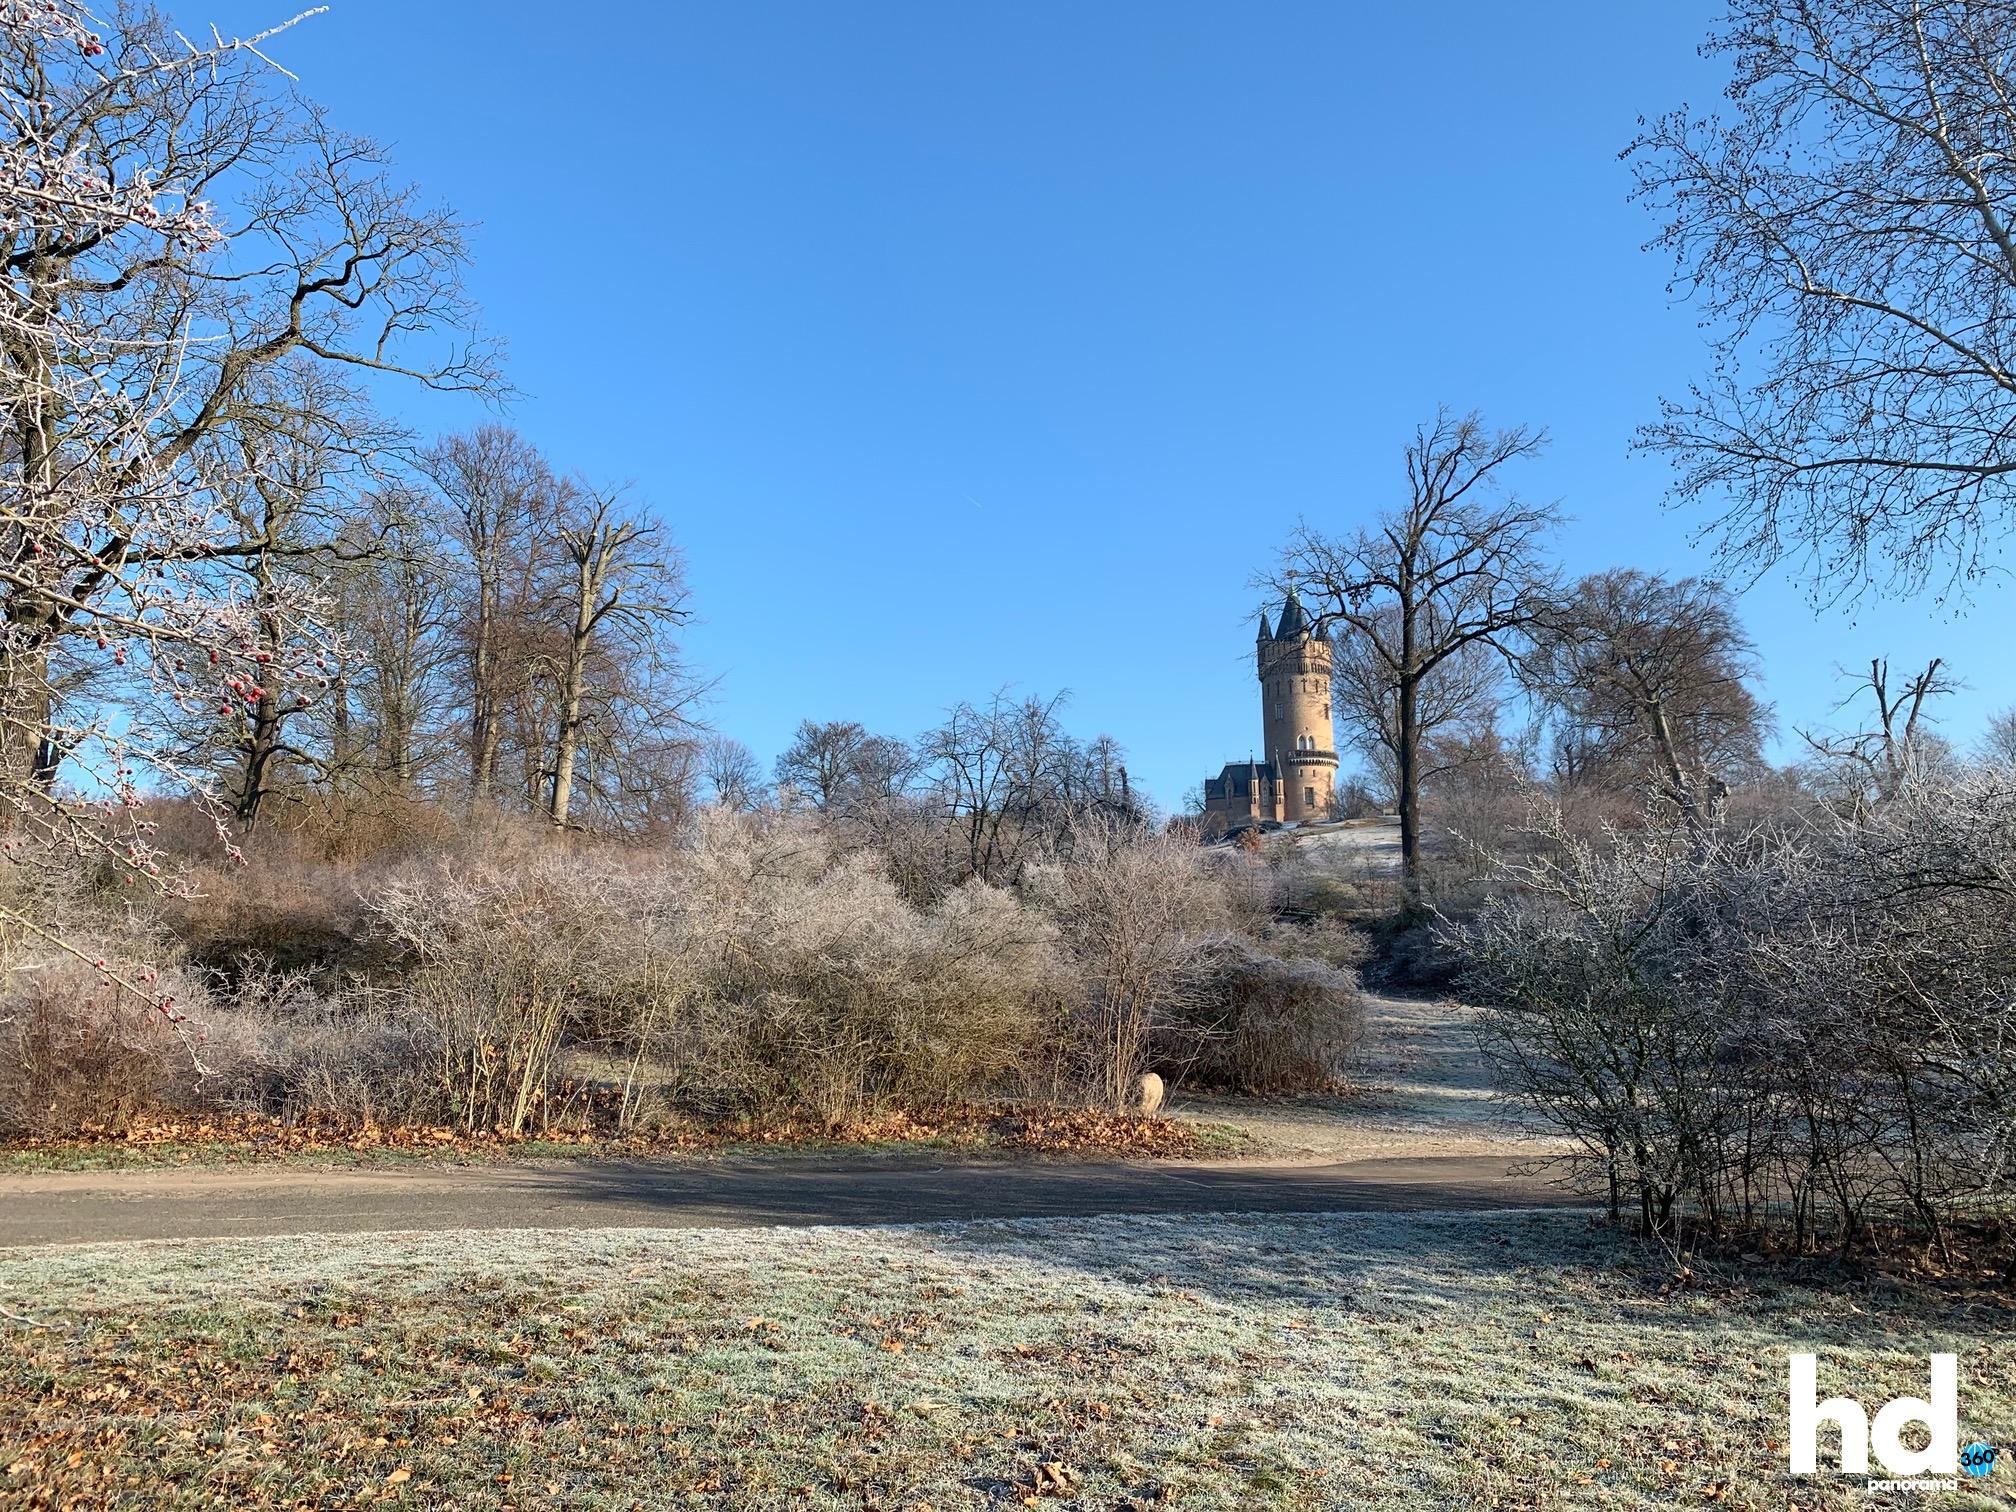 Park Babelsberg: Alles sehr frostig - Blick auf den Flatowturm - HD-Panorama © René Blanke